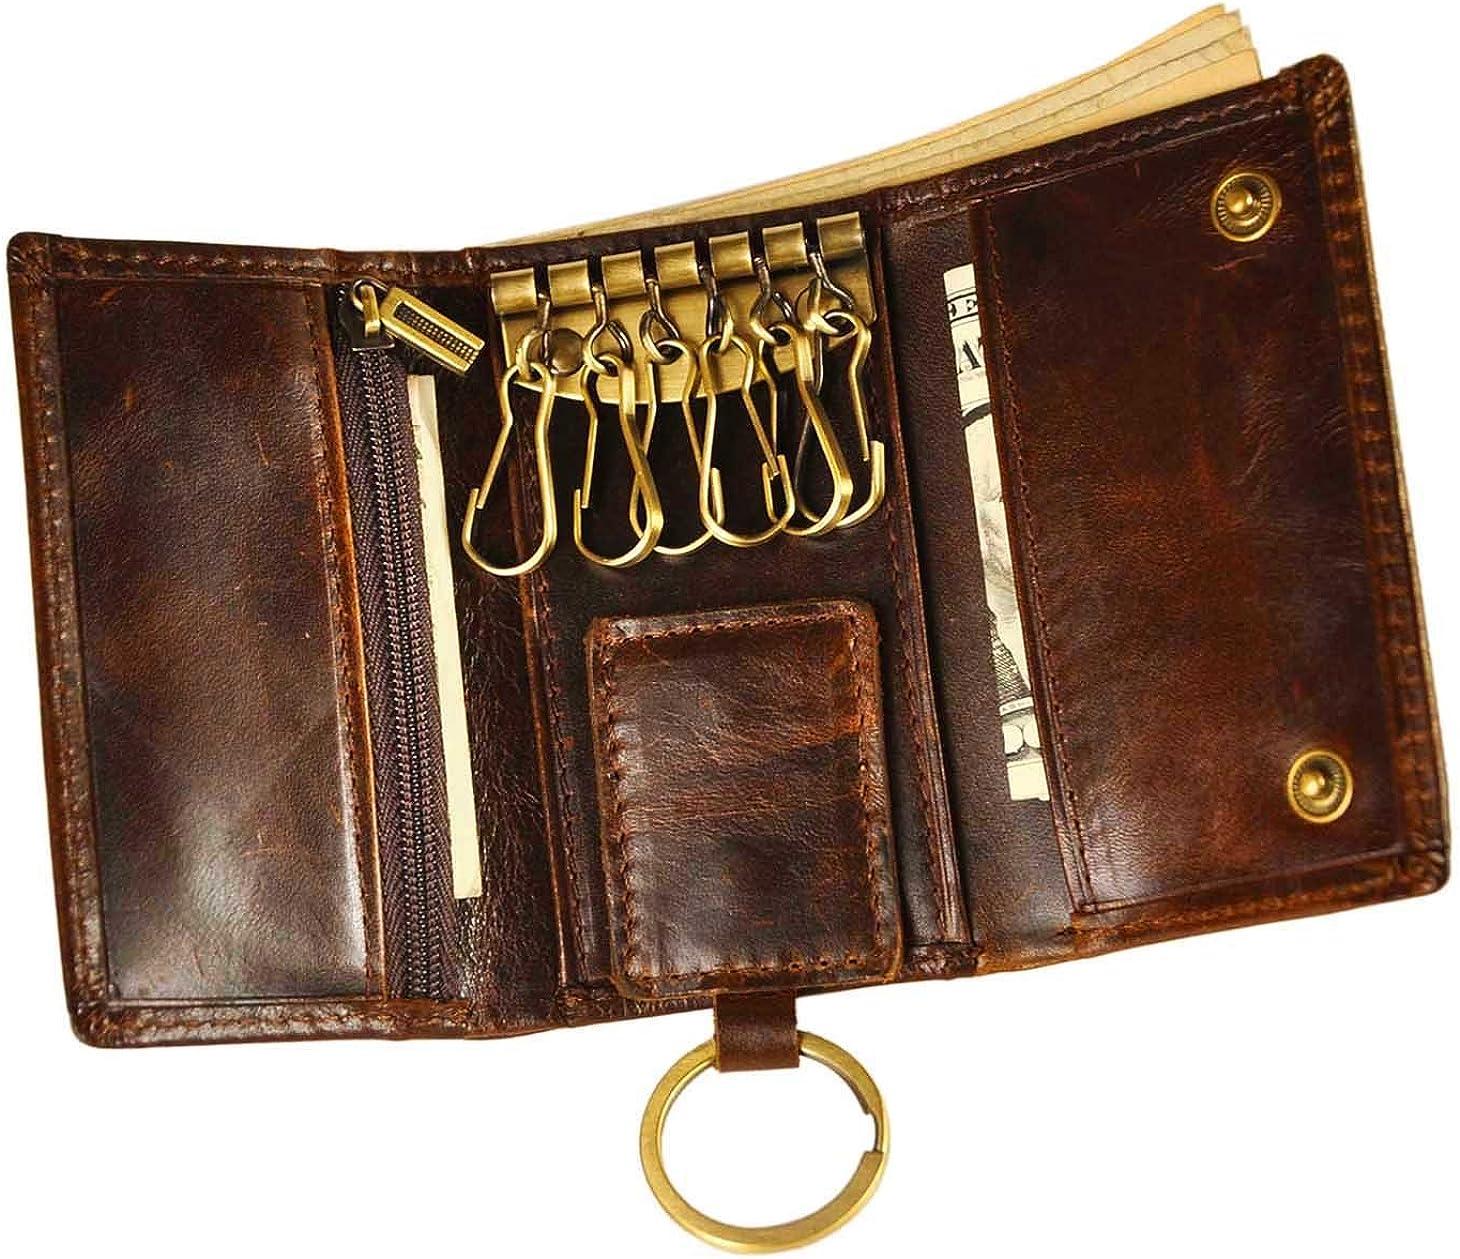 Le'aokuu Mens Genuine Leather Car Key Case Loop Hook Coin Case Cover Wallet Snap